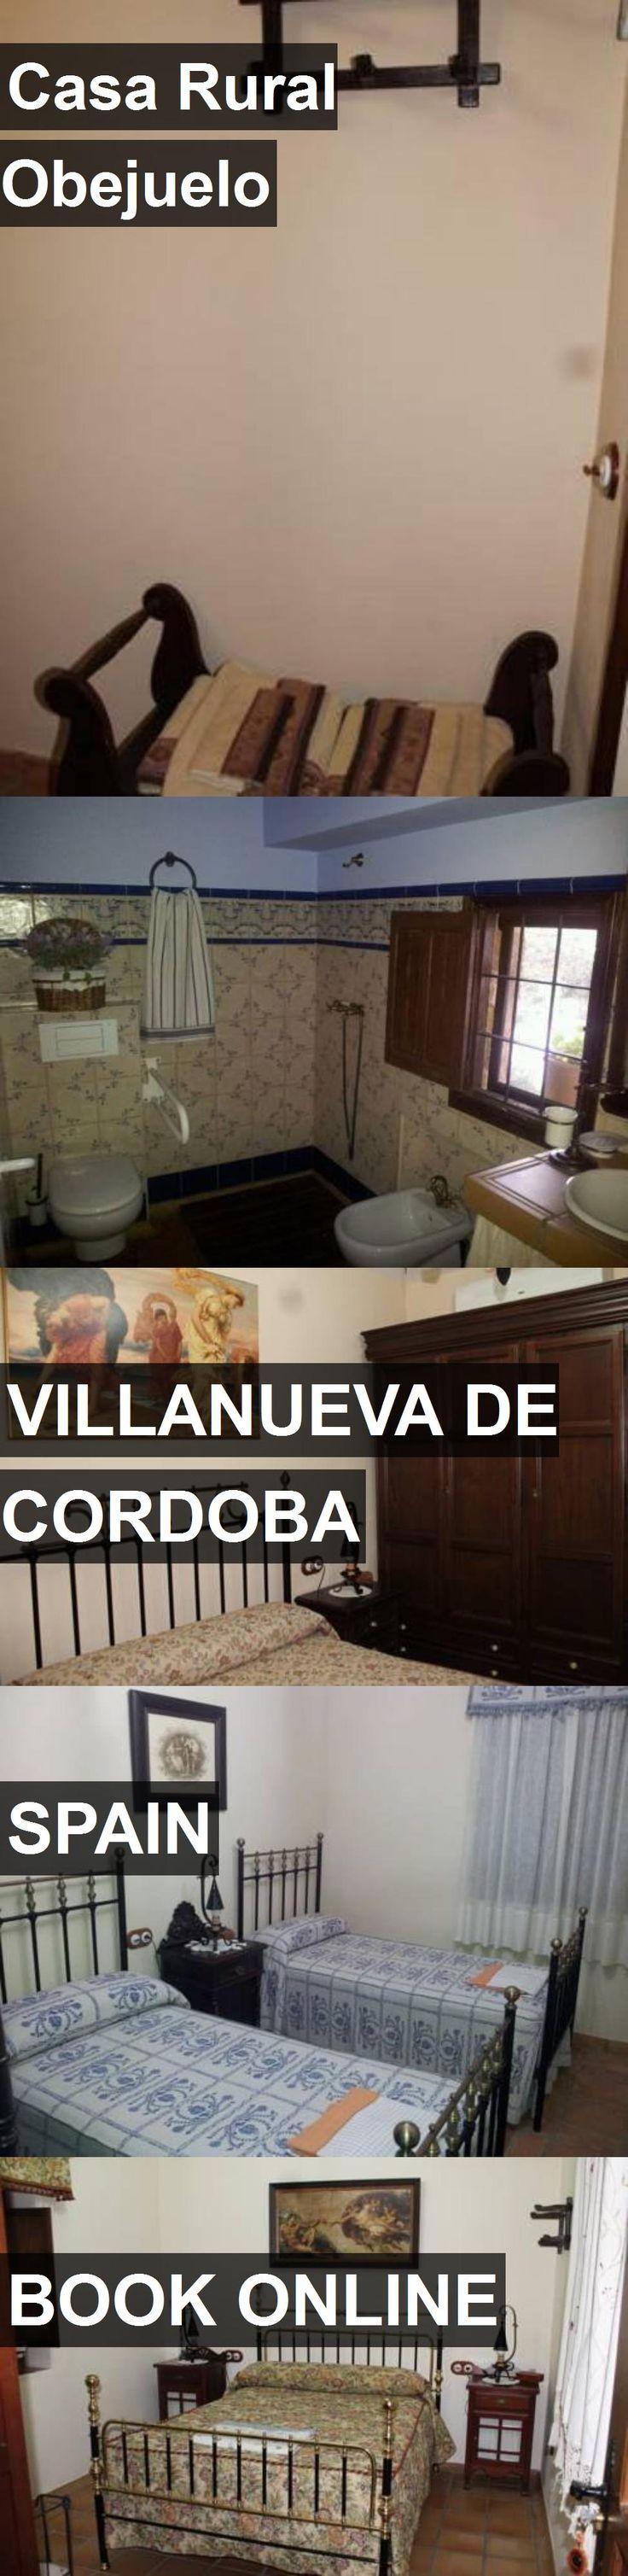 Hotel Casa Rural Obejuelo in Villanueva de Cordoba, Spain. For more information, photos, reviews and best prices please follow the link. #Spain #VillanuevadeCordoba #travel #vacation #hotel